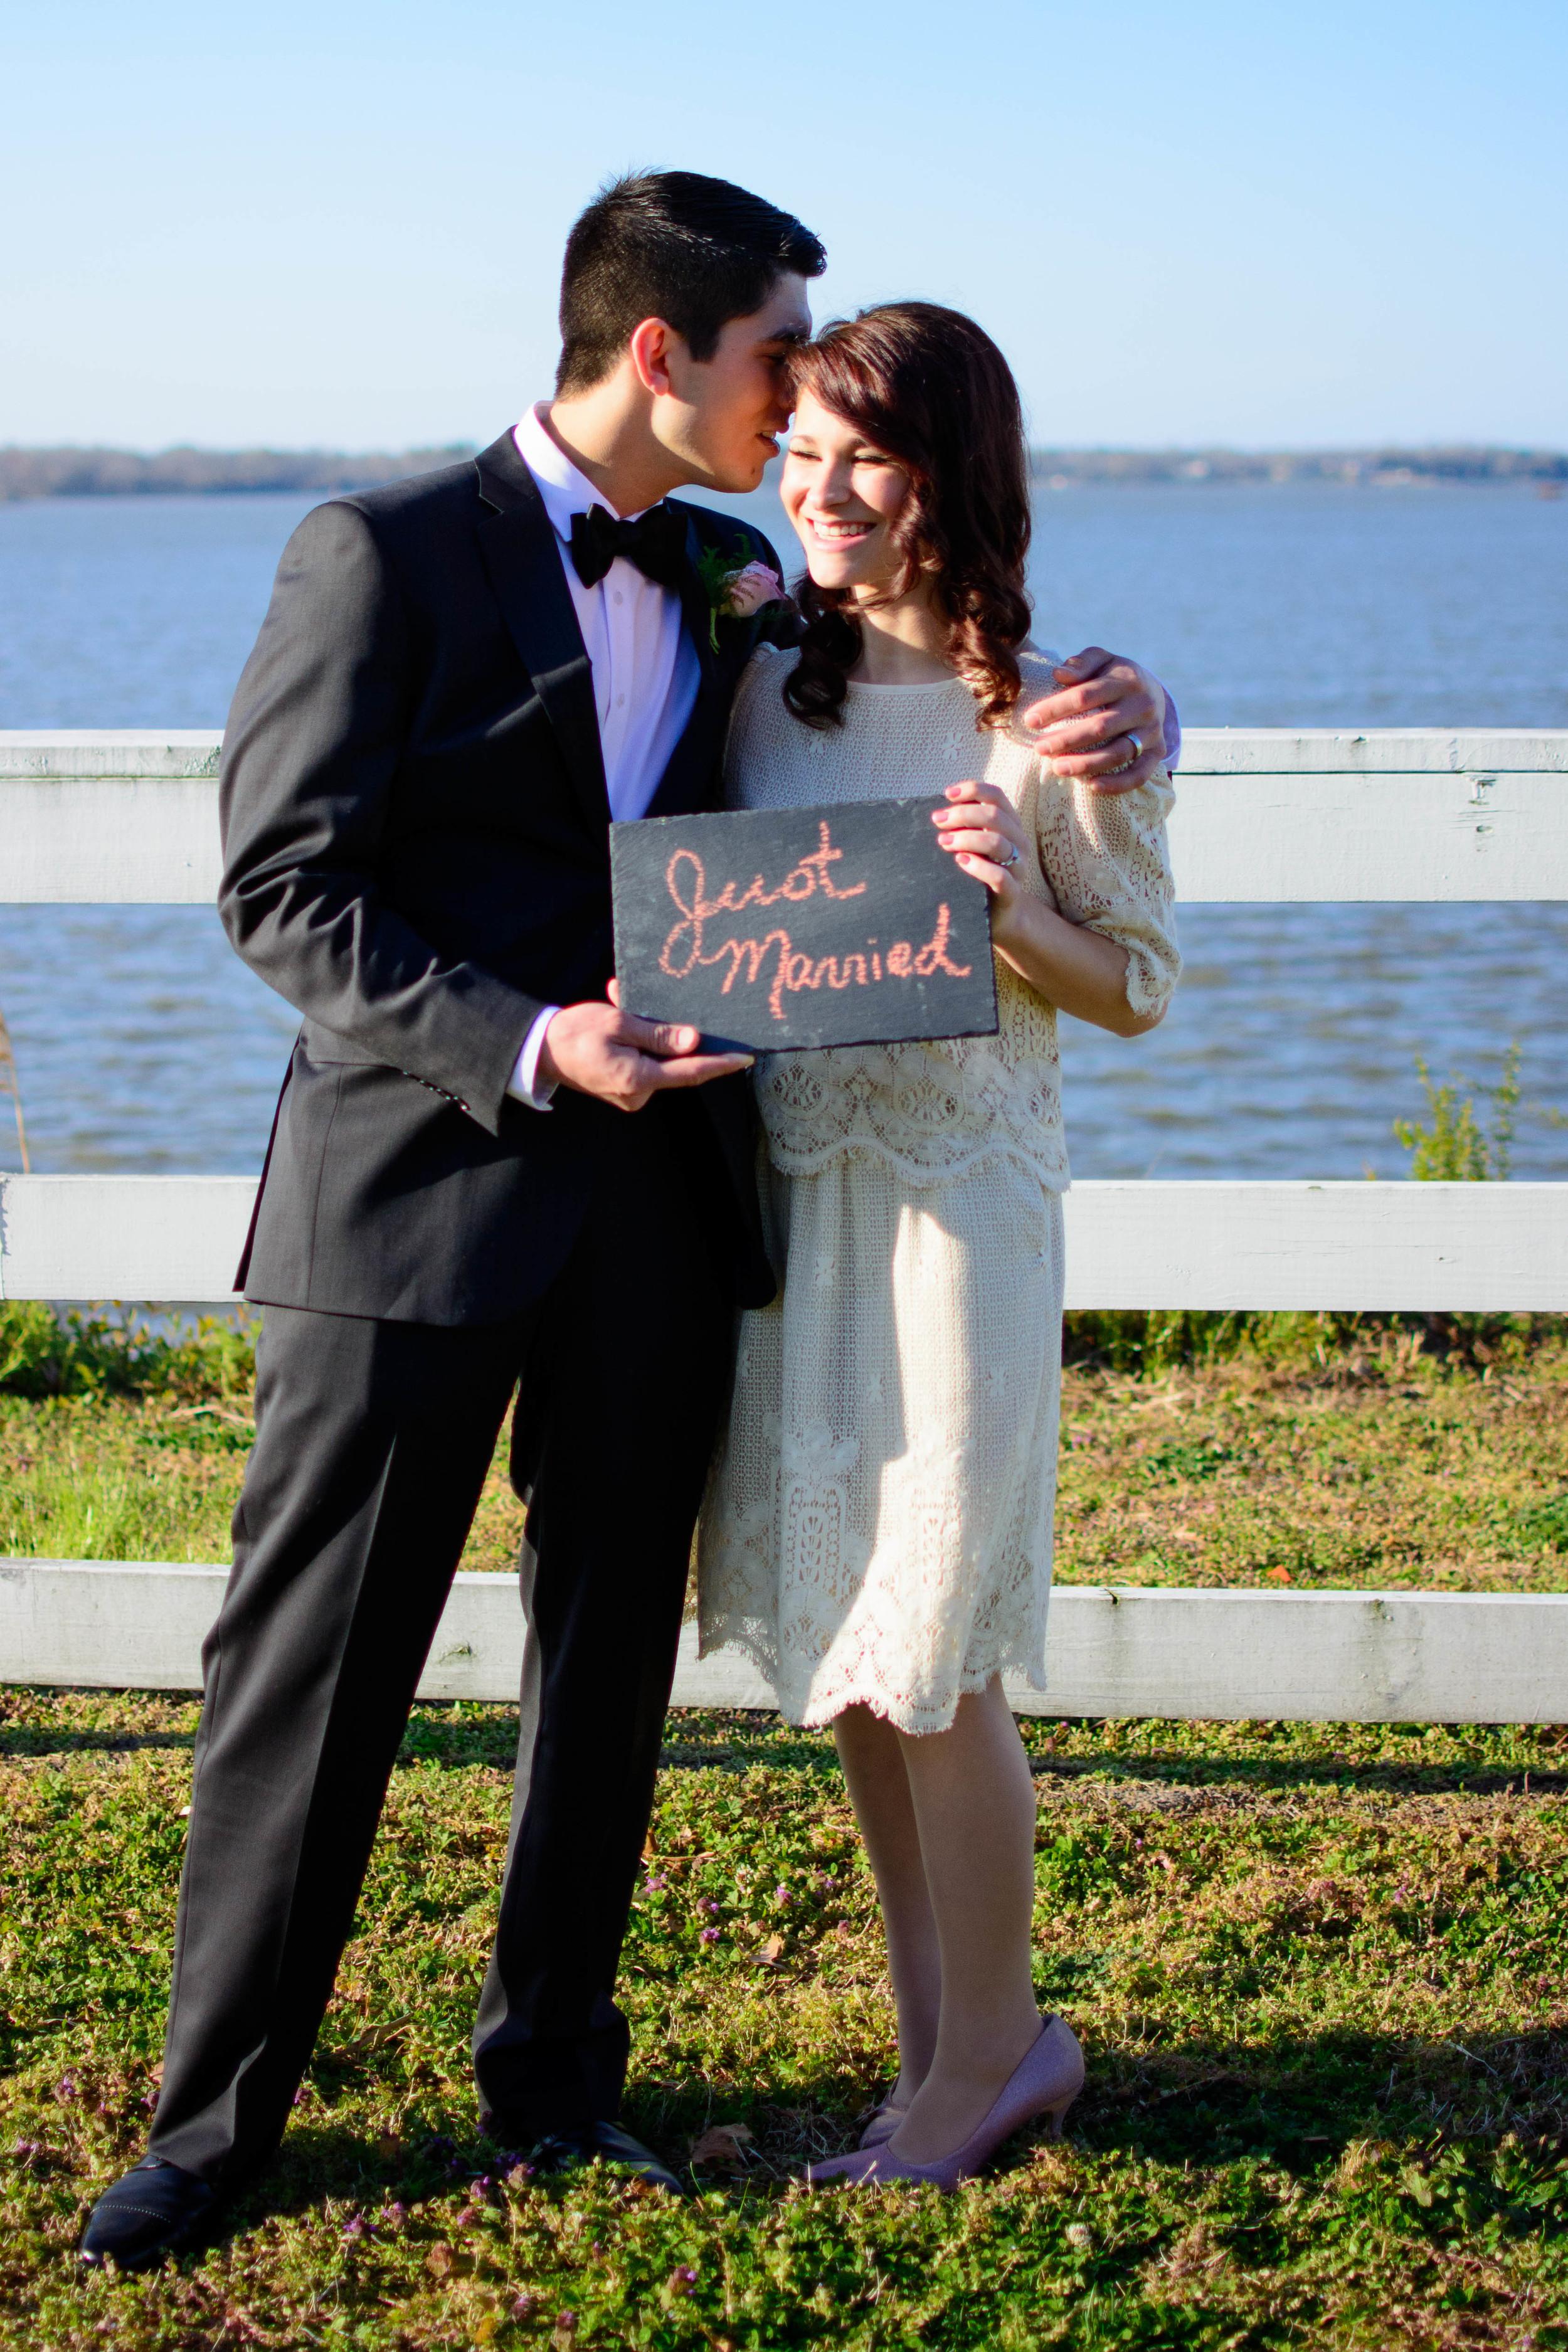 richmond-wedding-photography-27.jpg